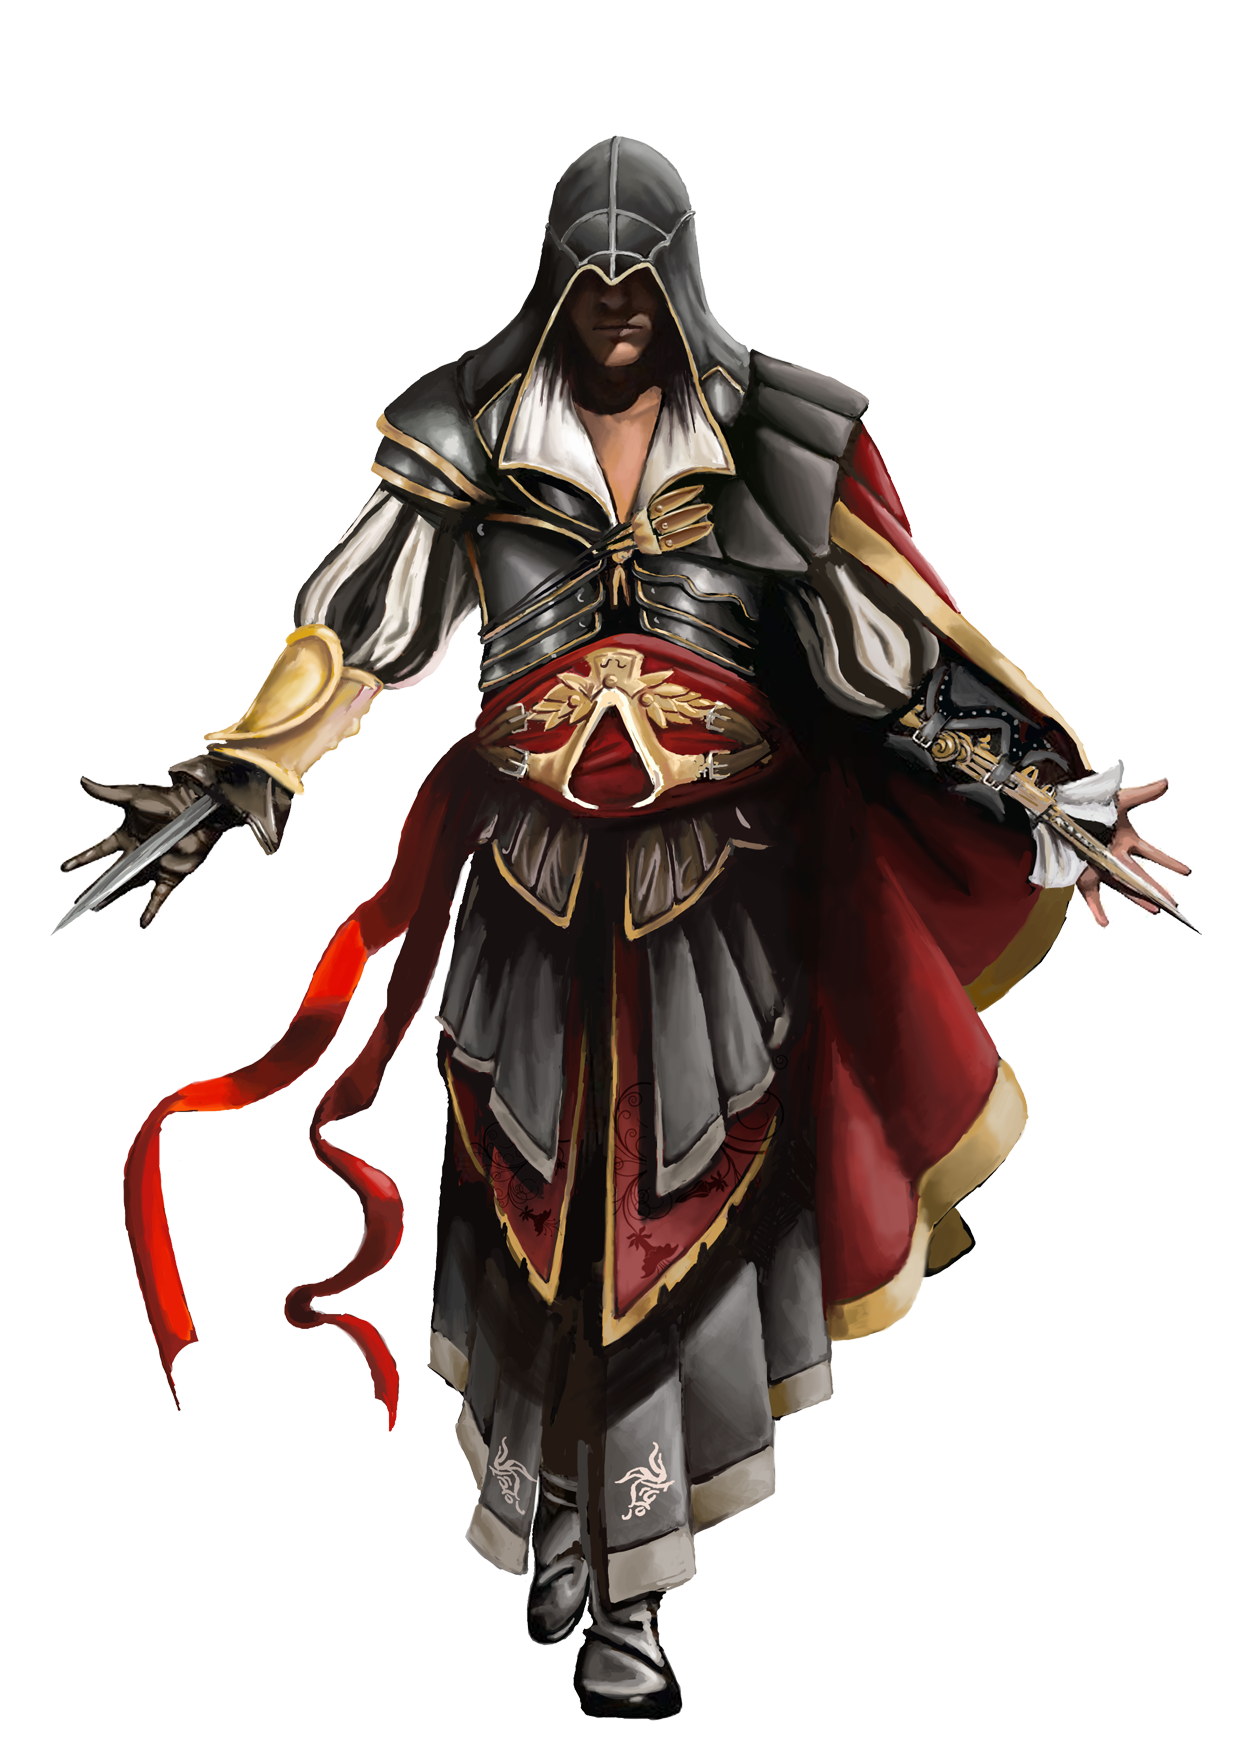 Ezioinarmorofatlair.png - Assassins Creed, Transparent background PNG HD thumbnail